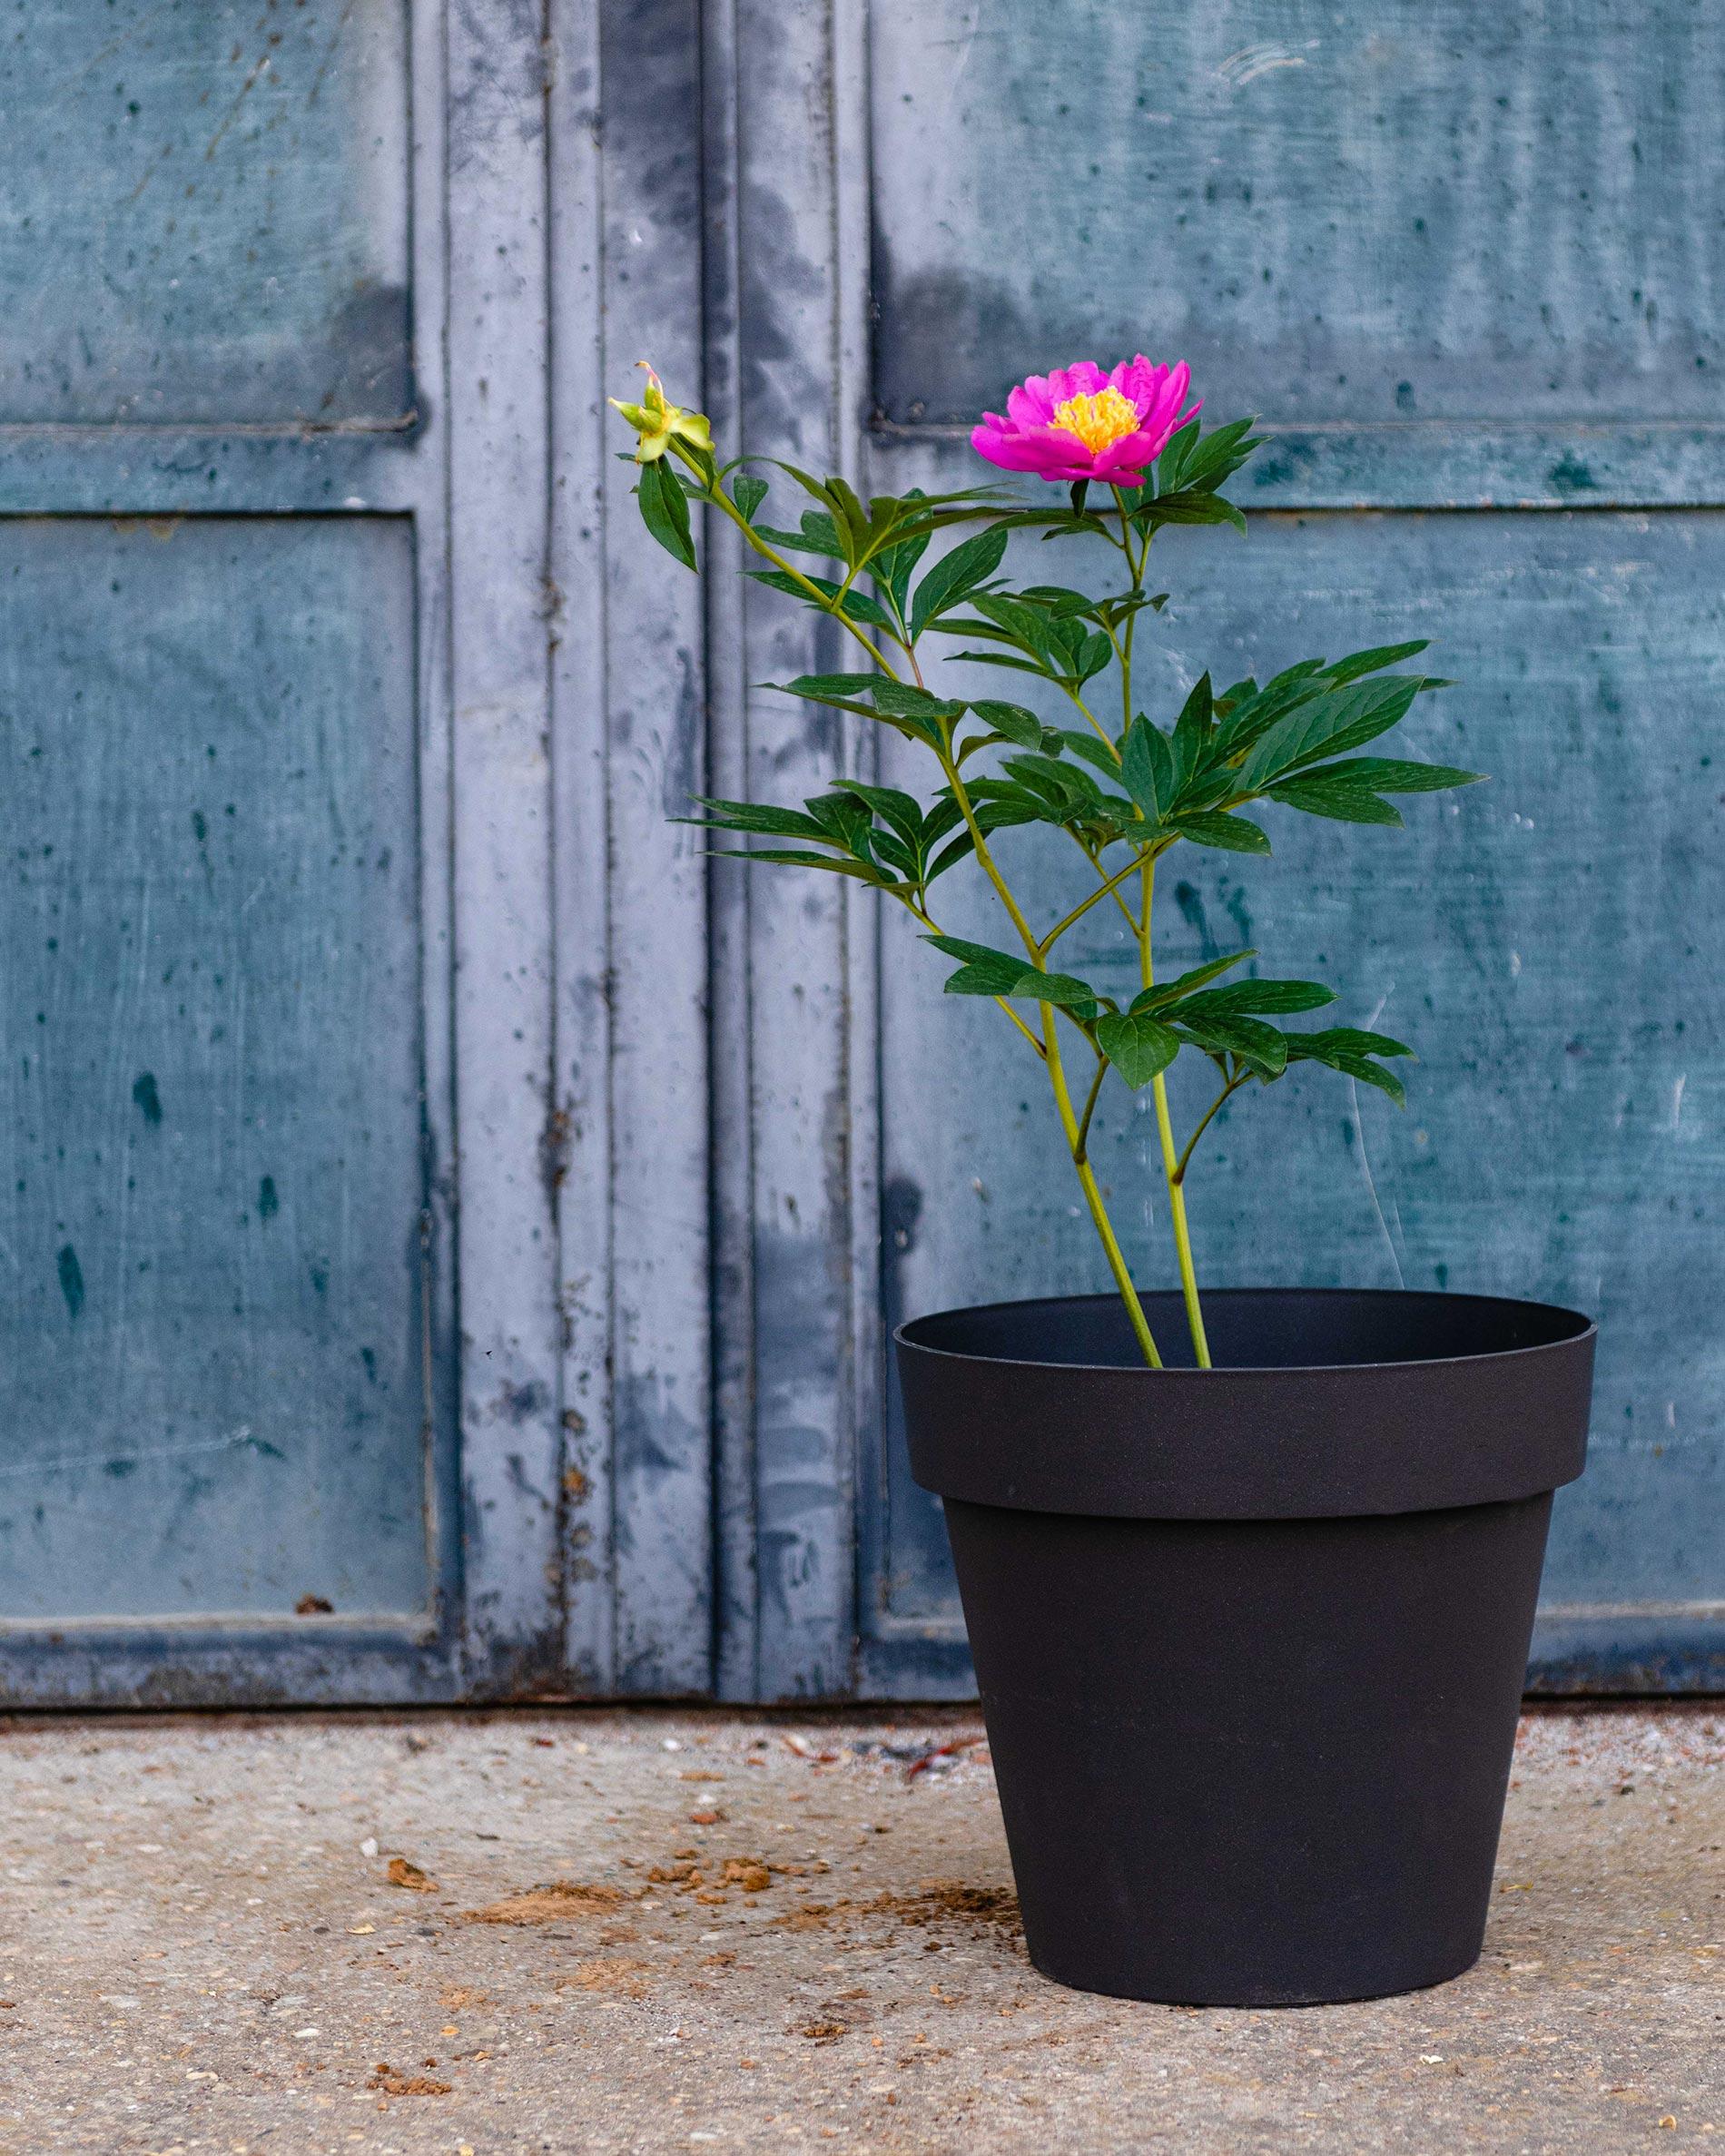 peonia pianta consigli e cura